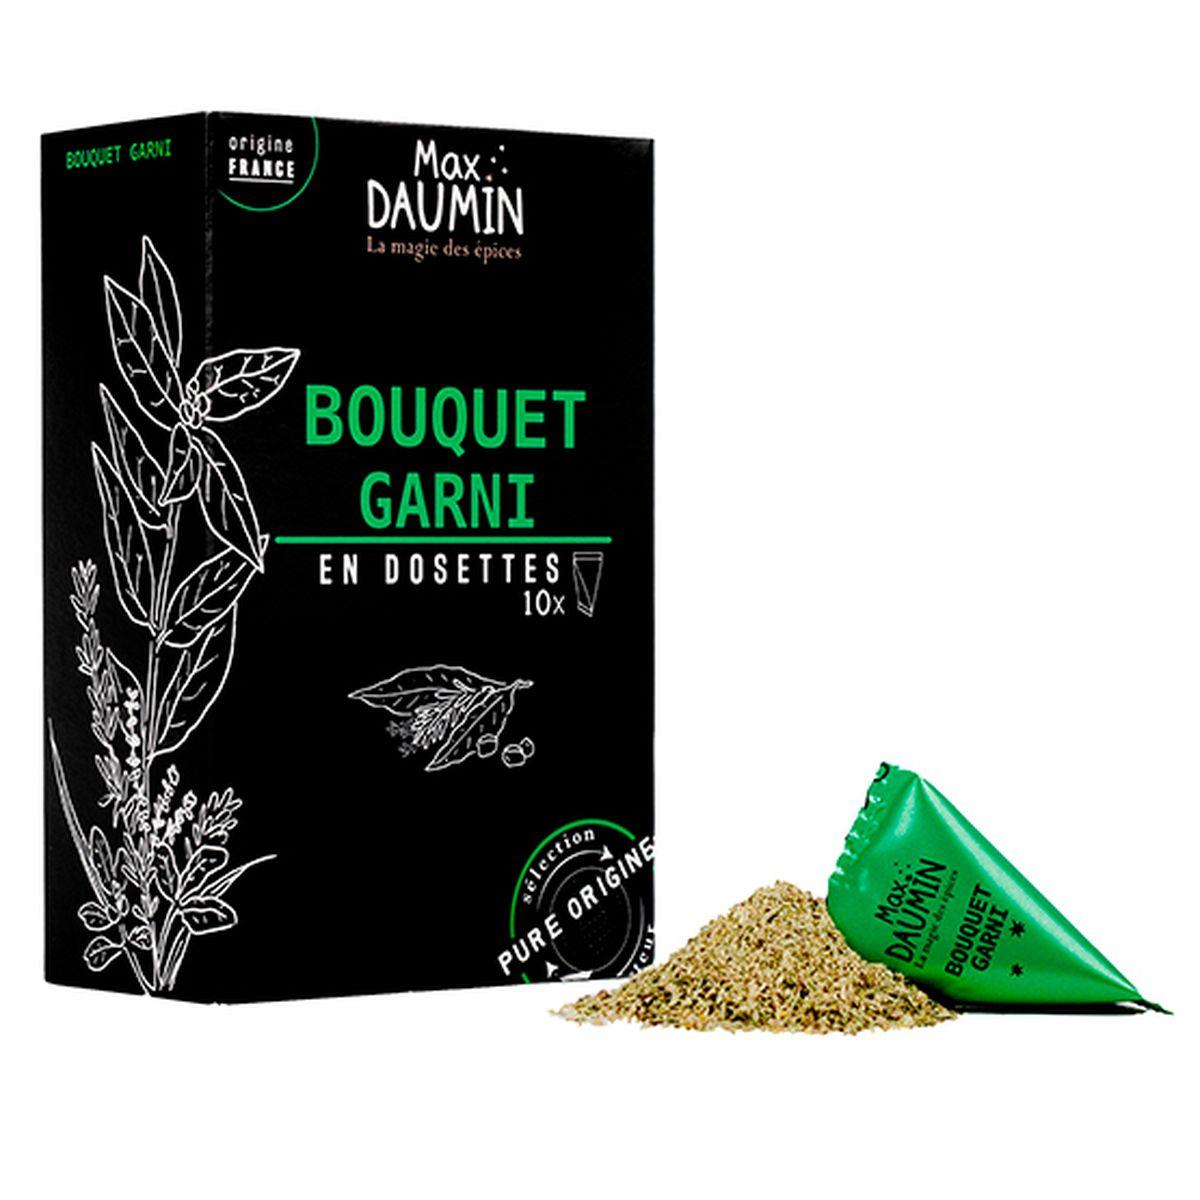 Bouquet garni - Max Daumin